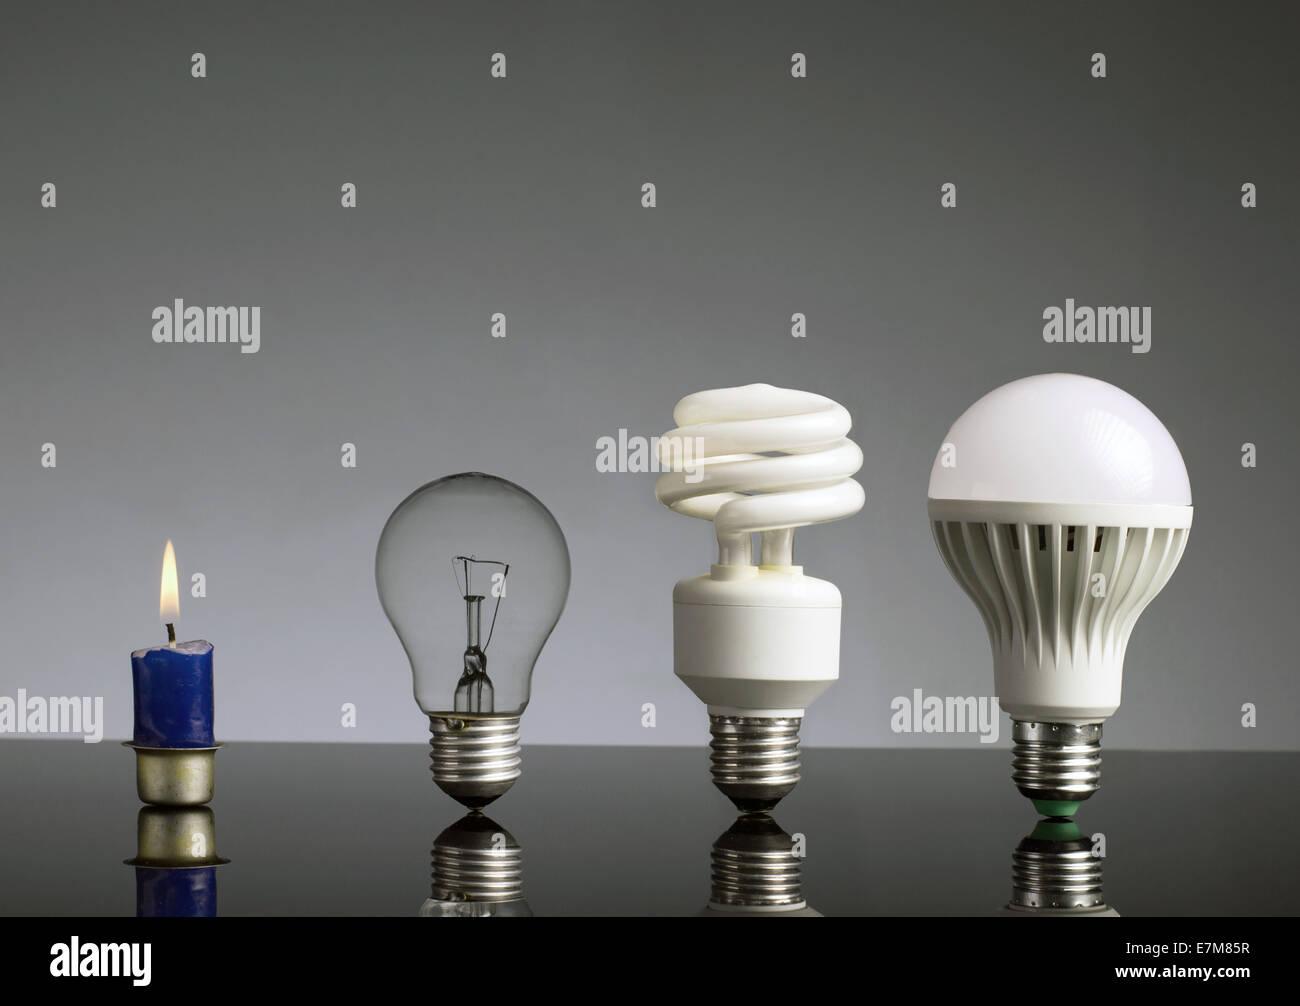 Concepto de evolución, Vela, lámpara de tungsteno, fluorescente bombilla y bombilla LED Imagen De Stock